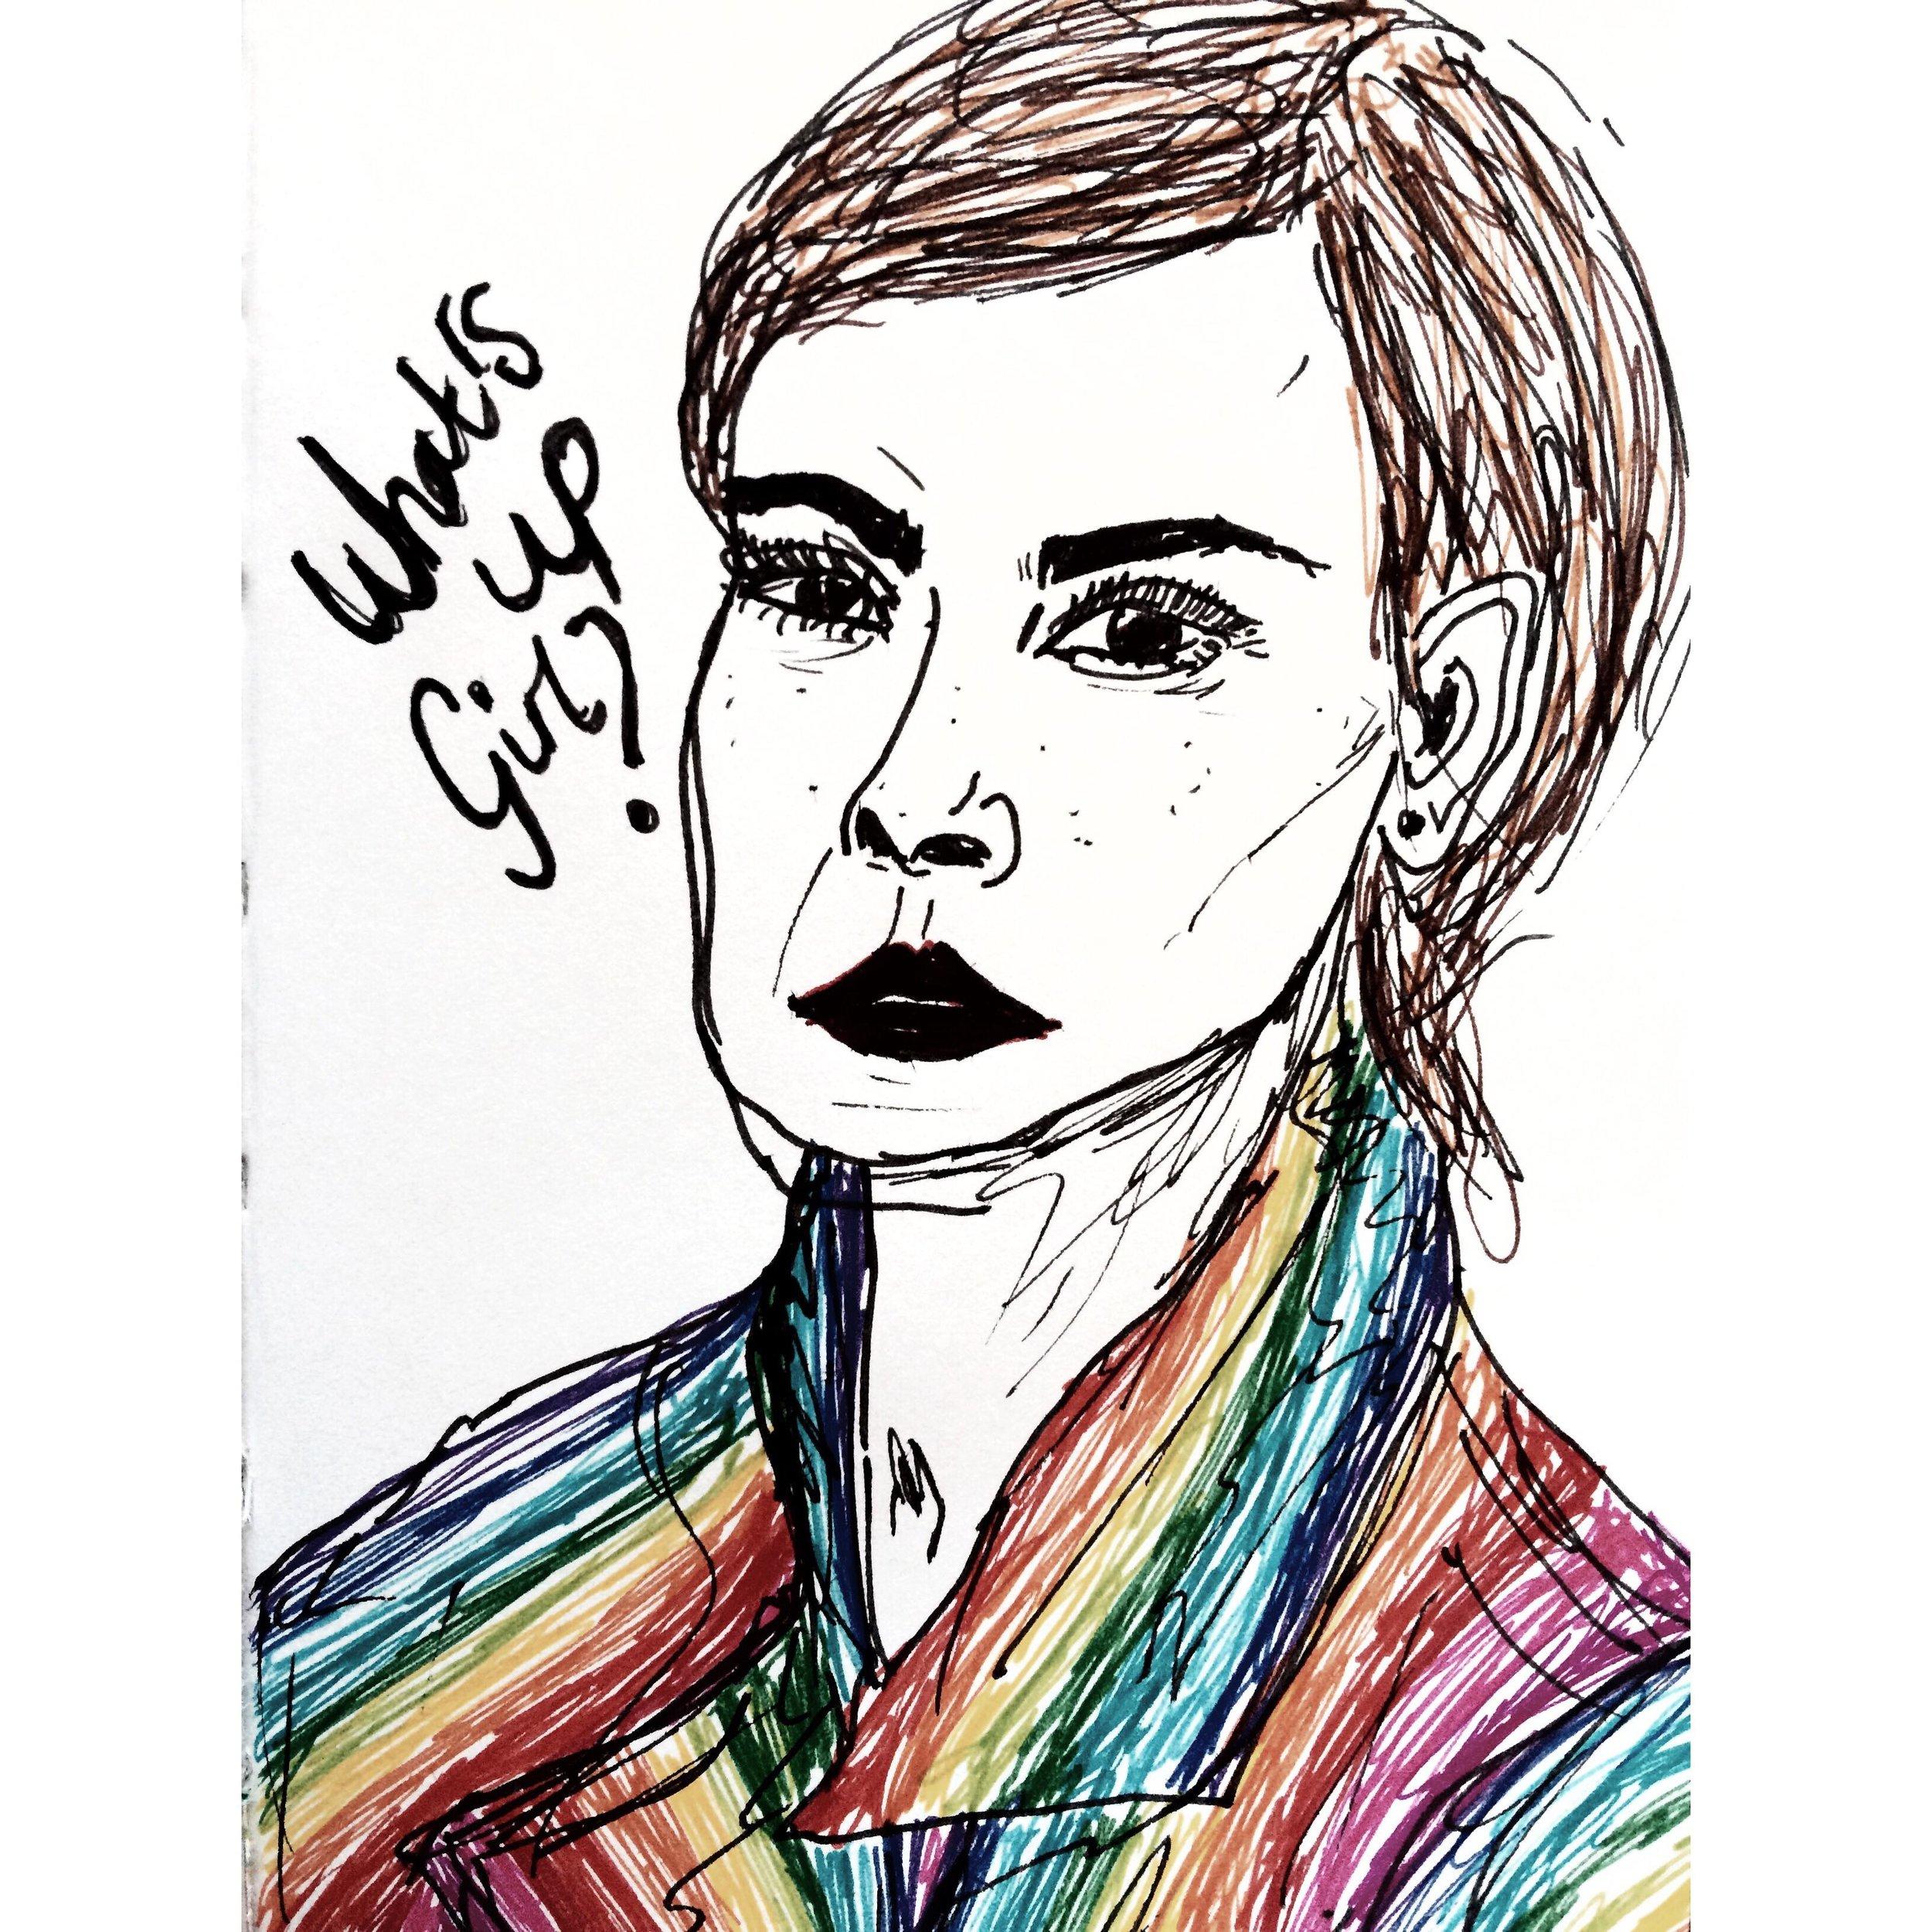 Emma Watson Portrait - What's up girl? - Artist: Ticaux